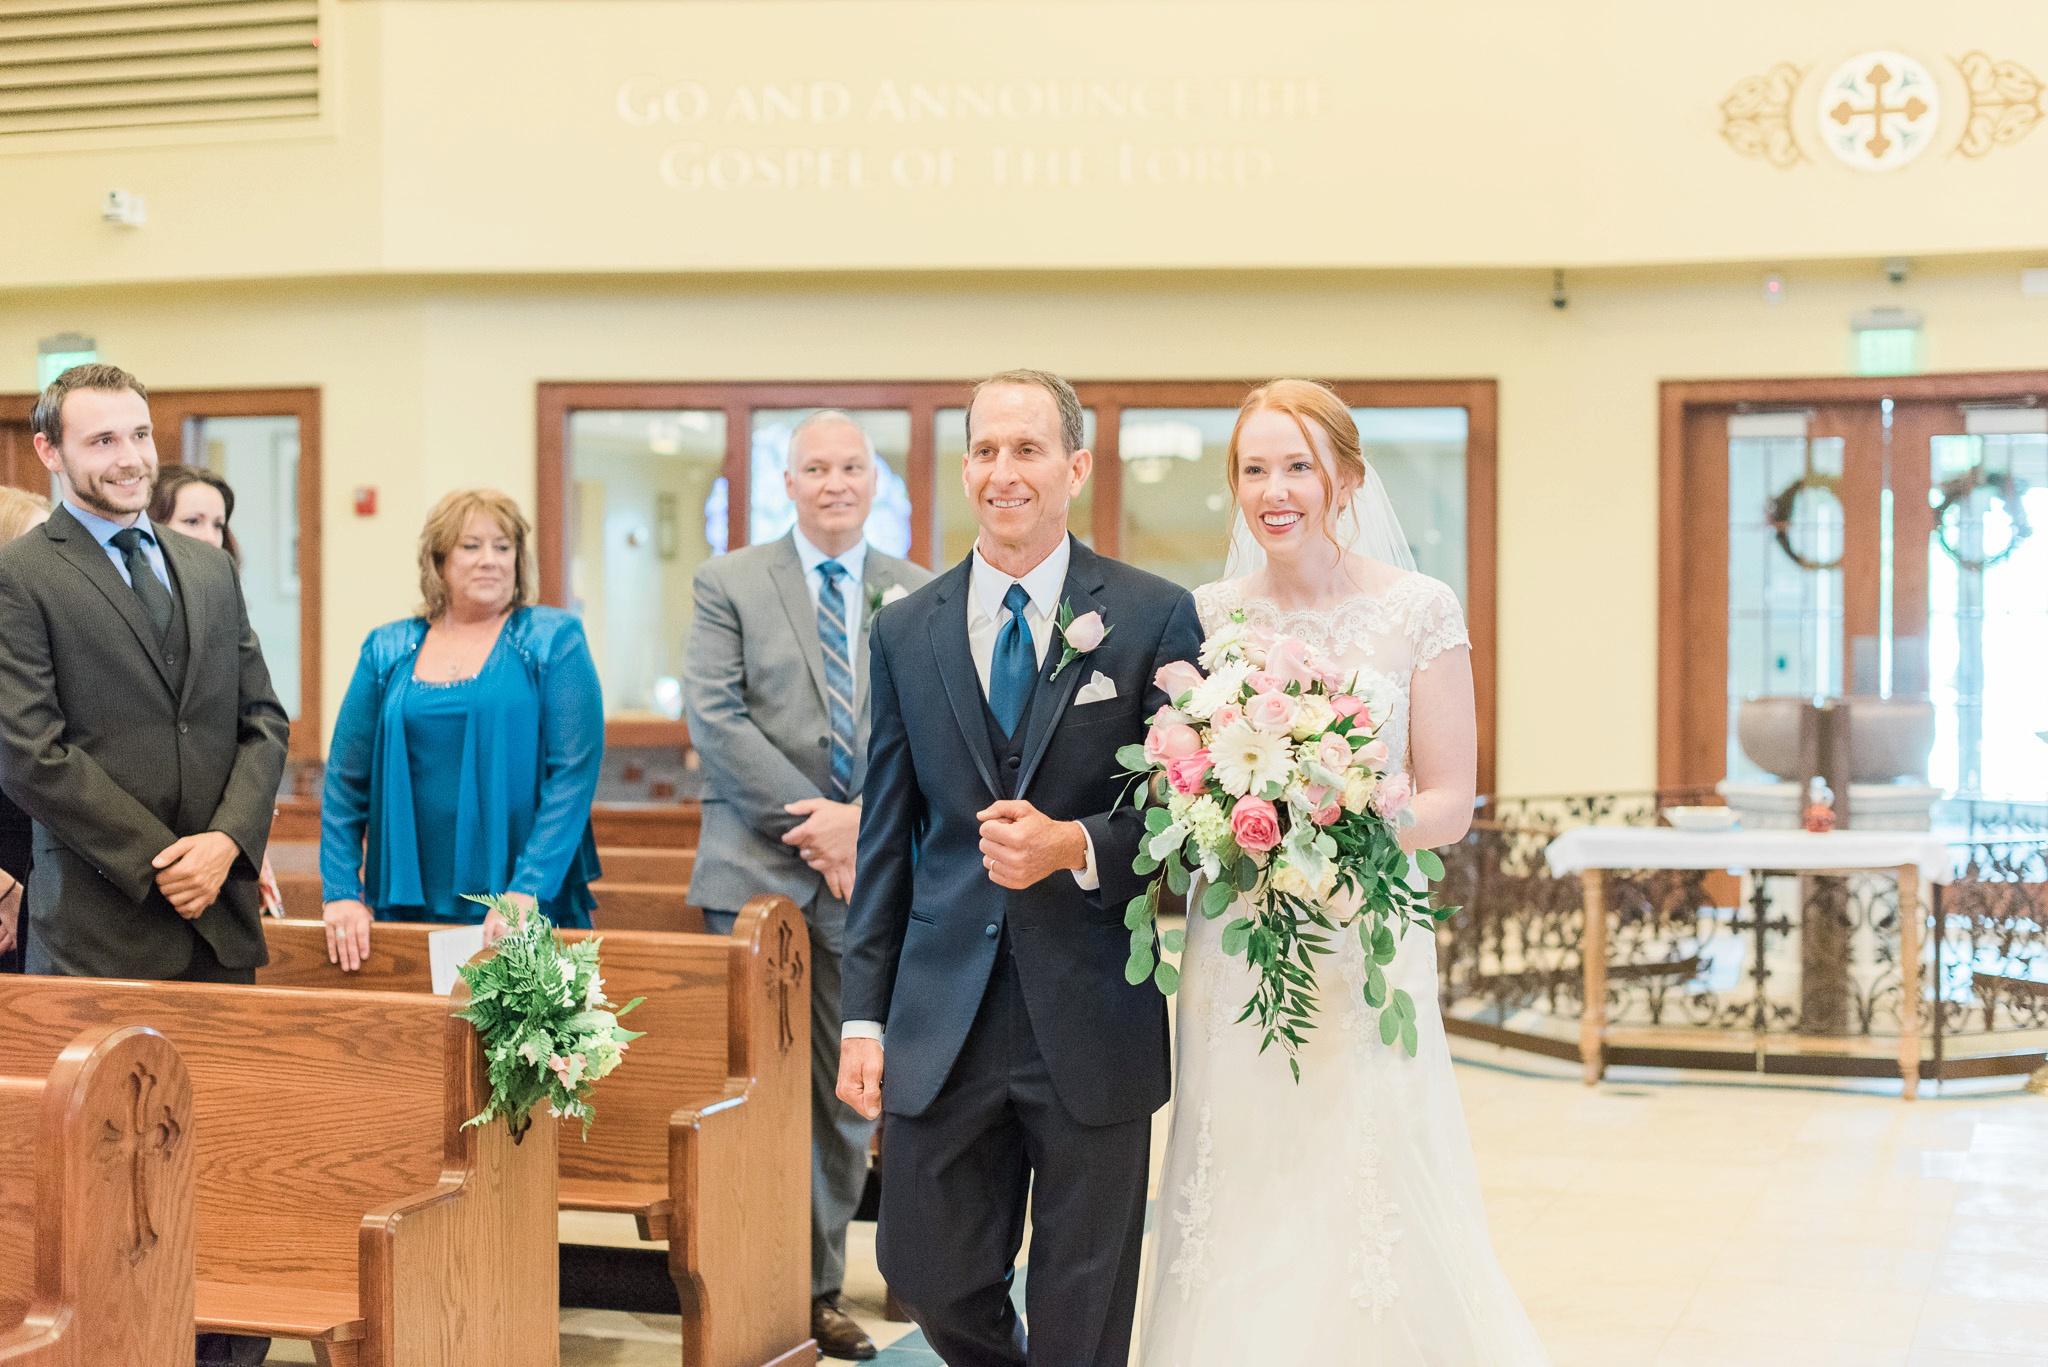 sunbury-ohio-wedding-hannah-johnathan_0024.jpg